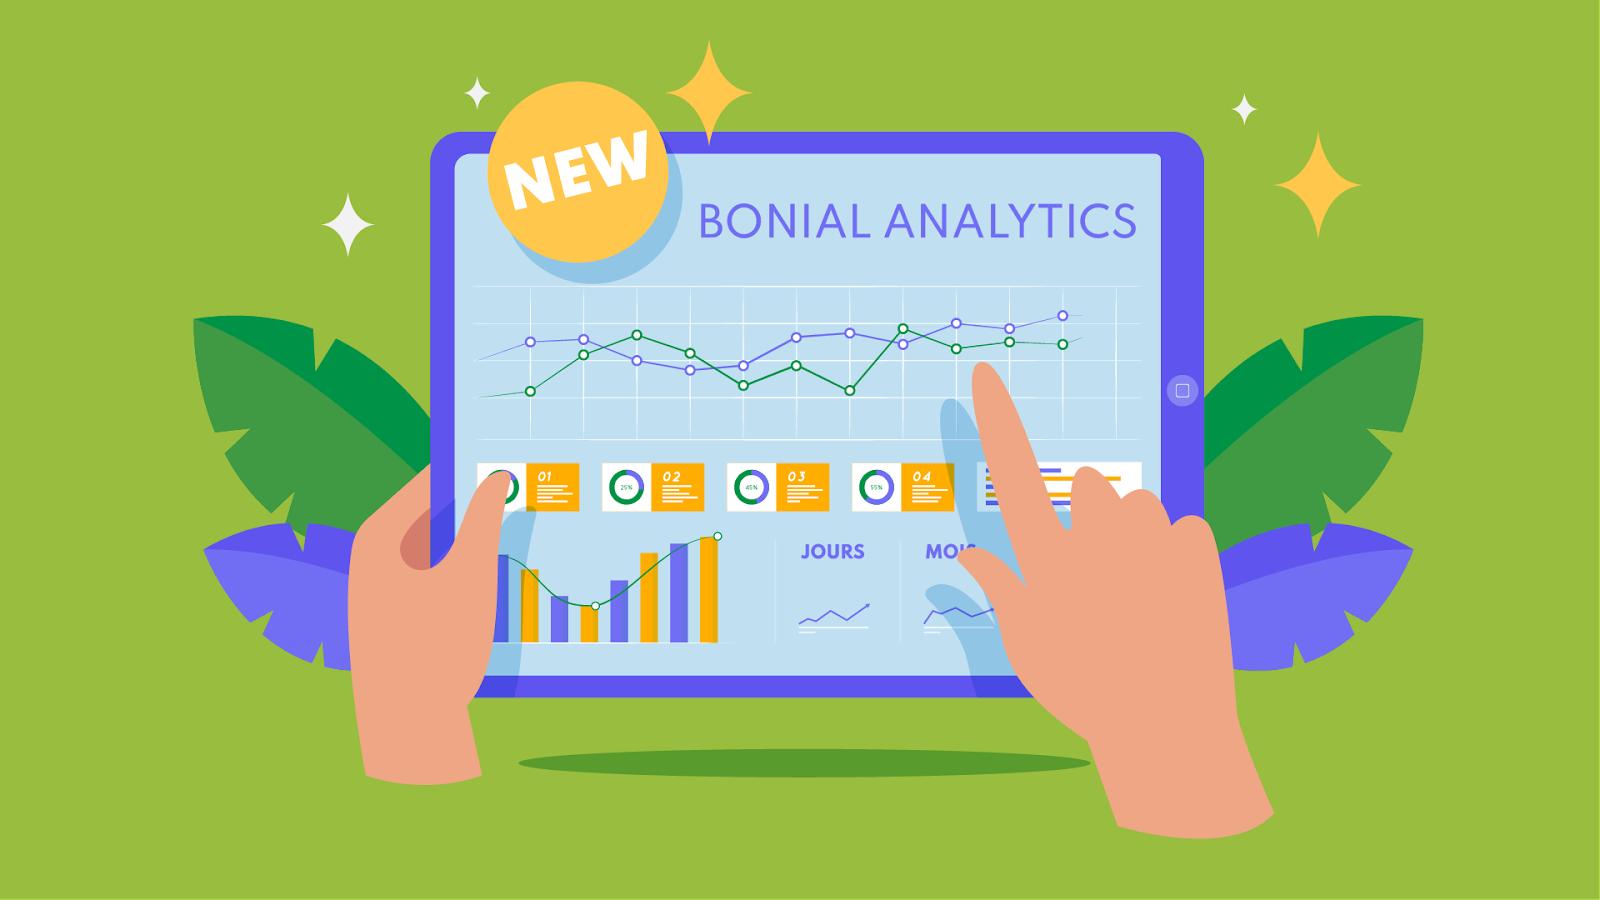 Bonial Analytics